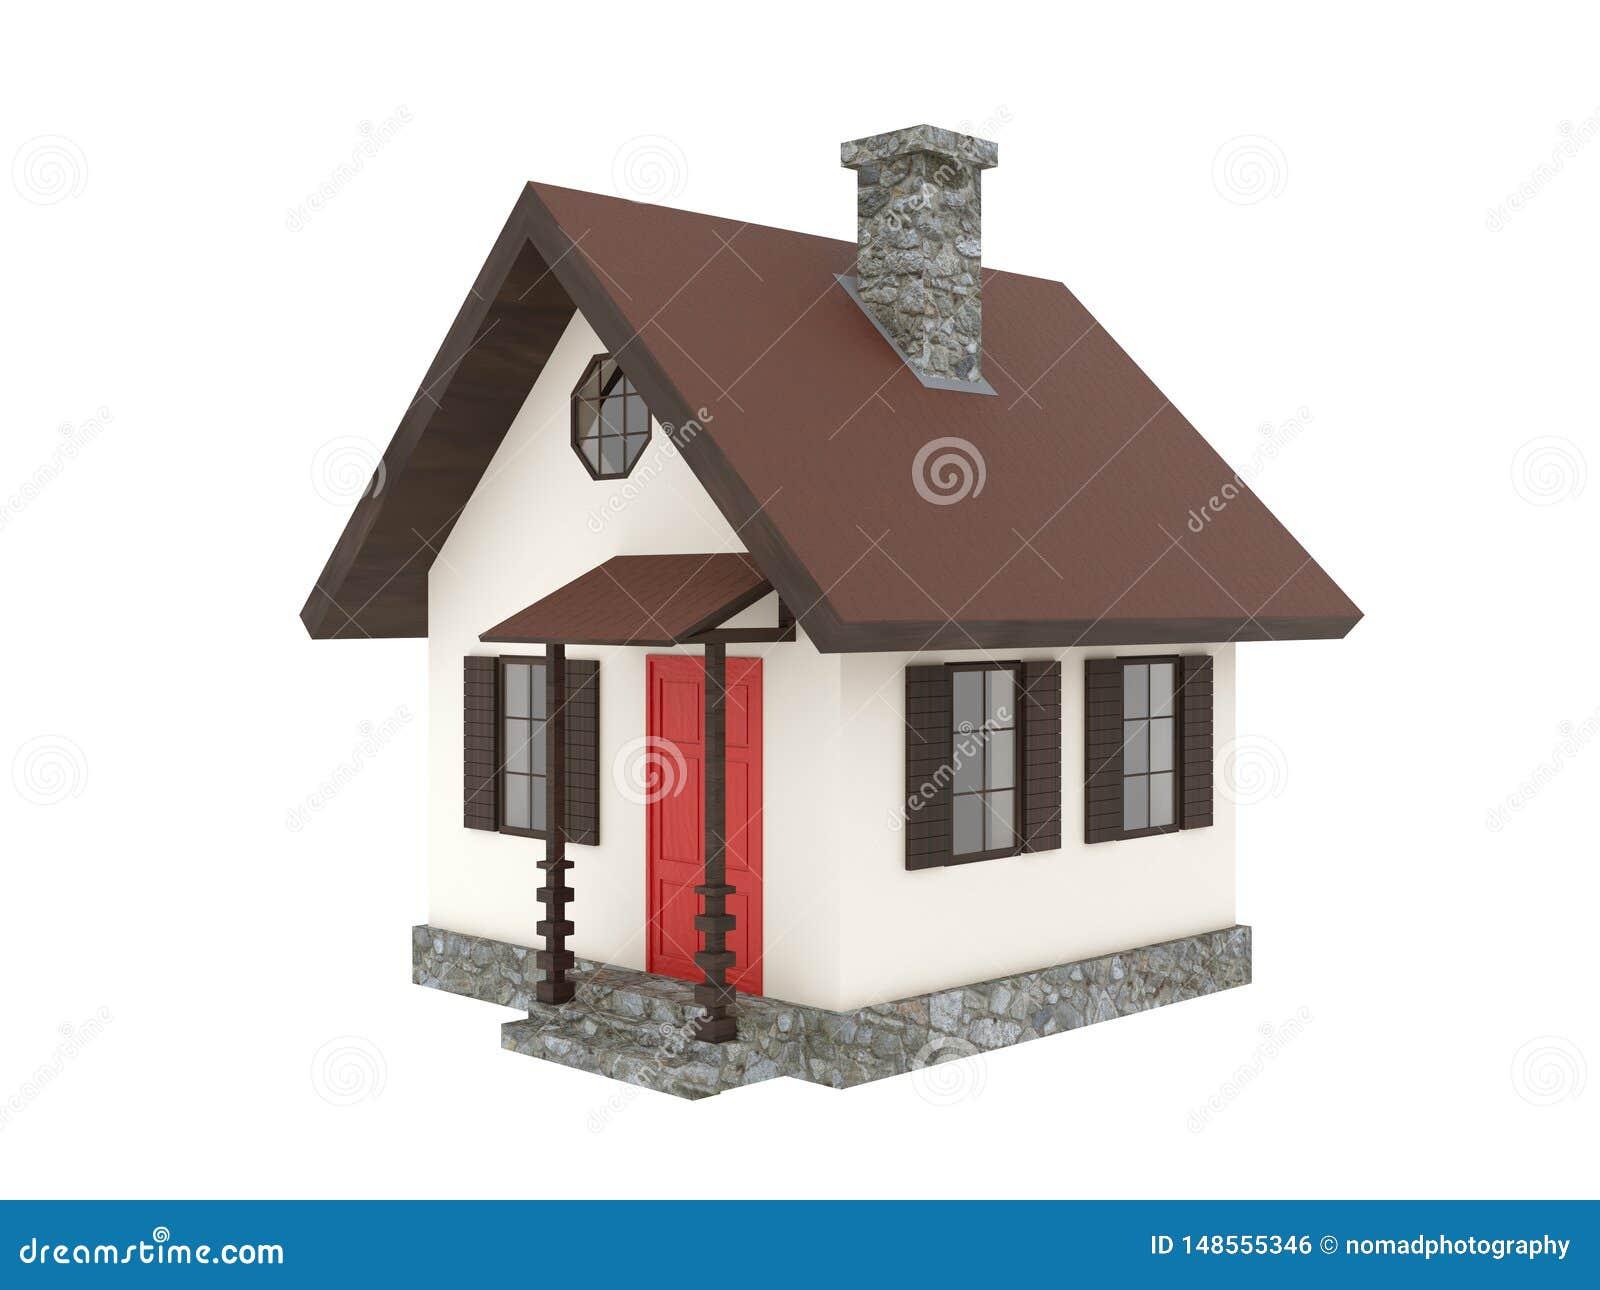 Mountain tiny house cabin